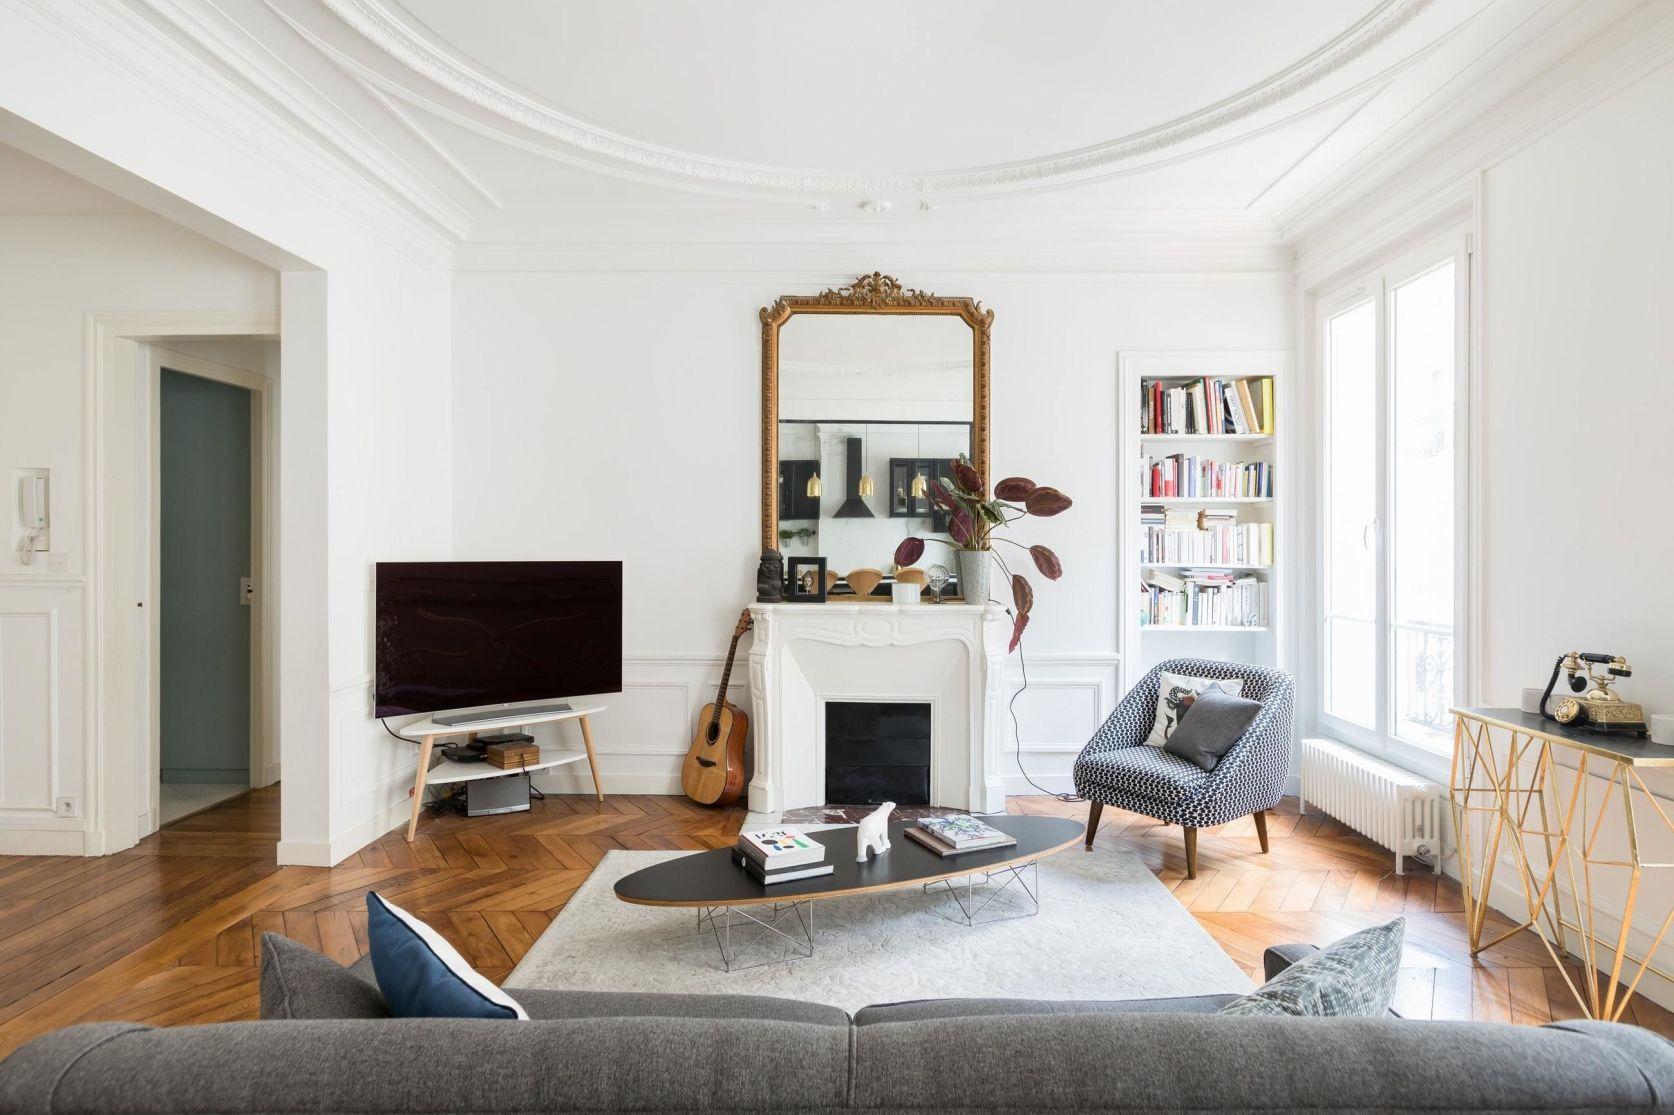 гостиная камин кресло зеркало телевизор